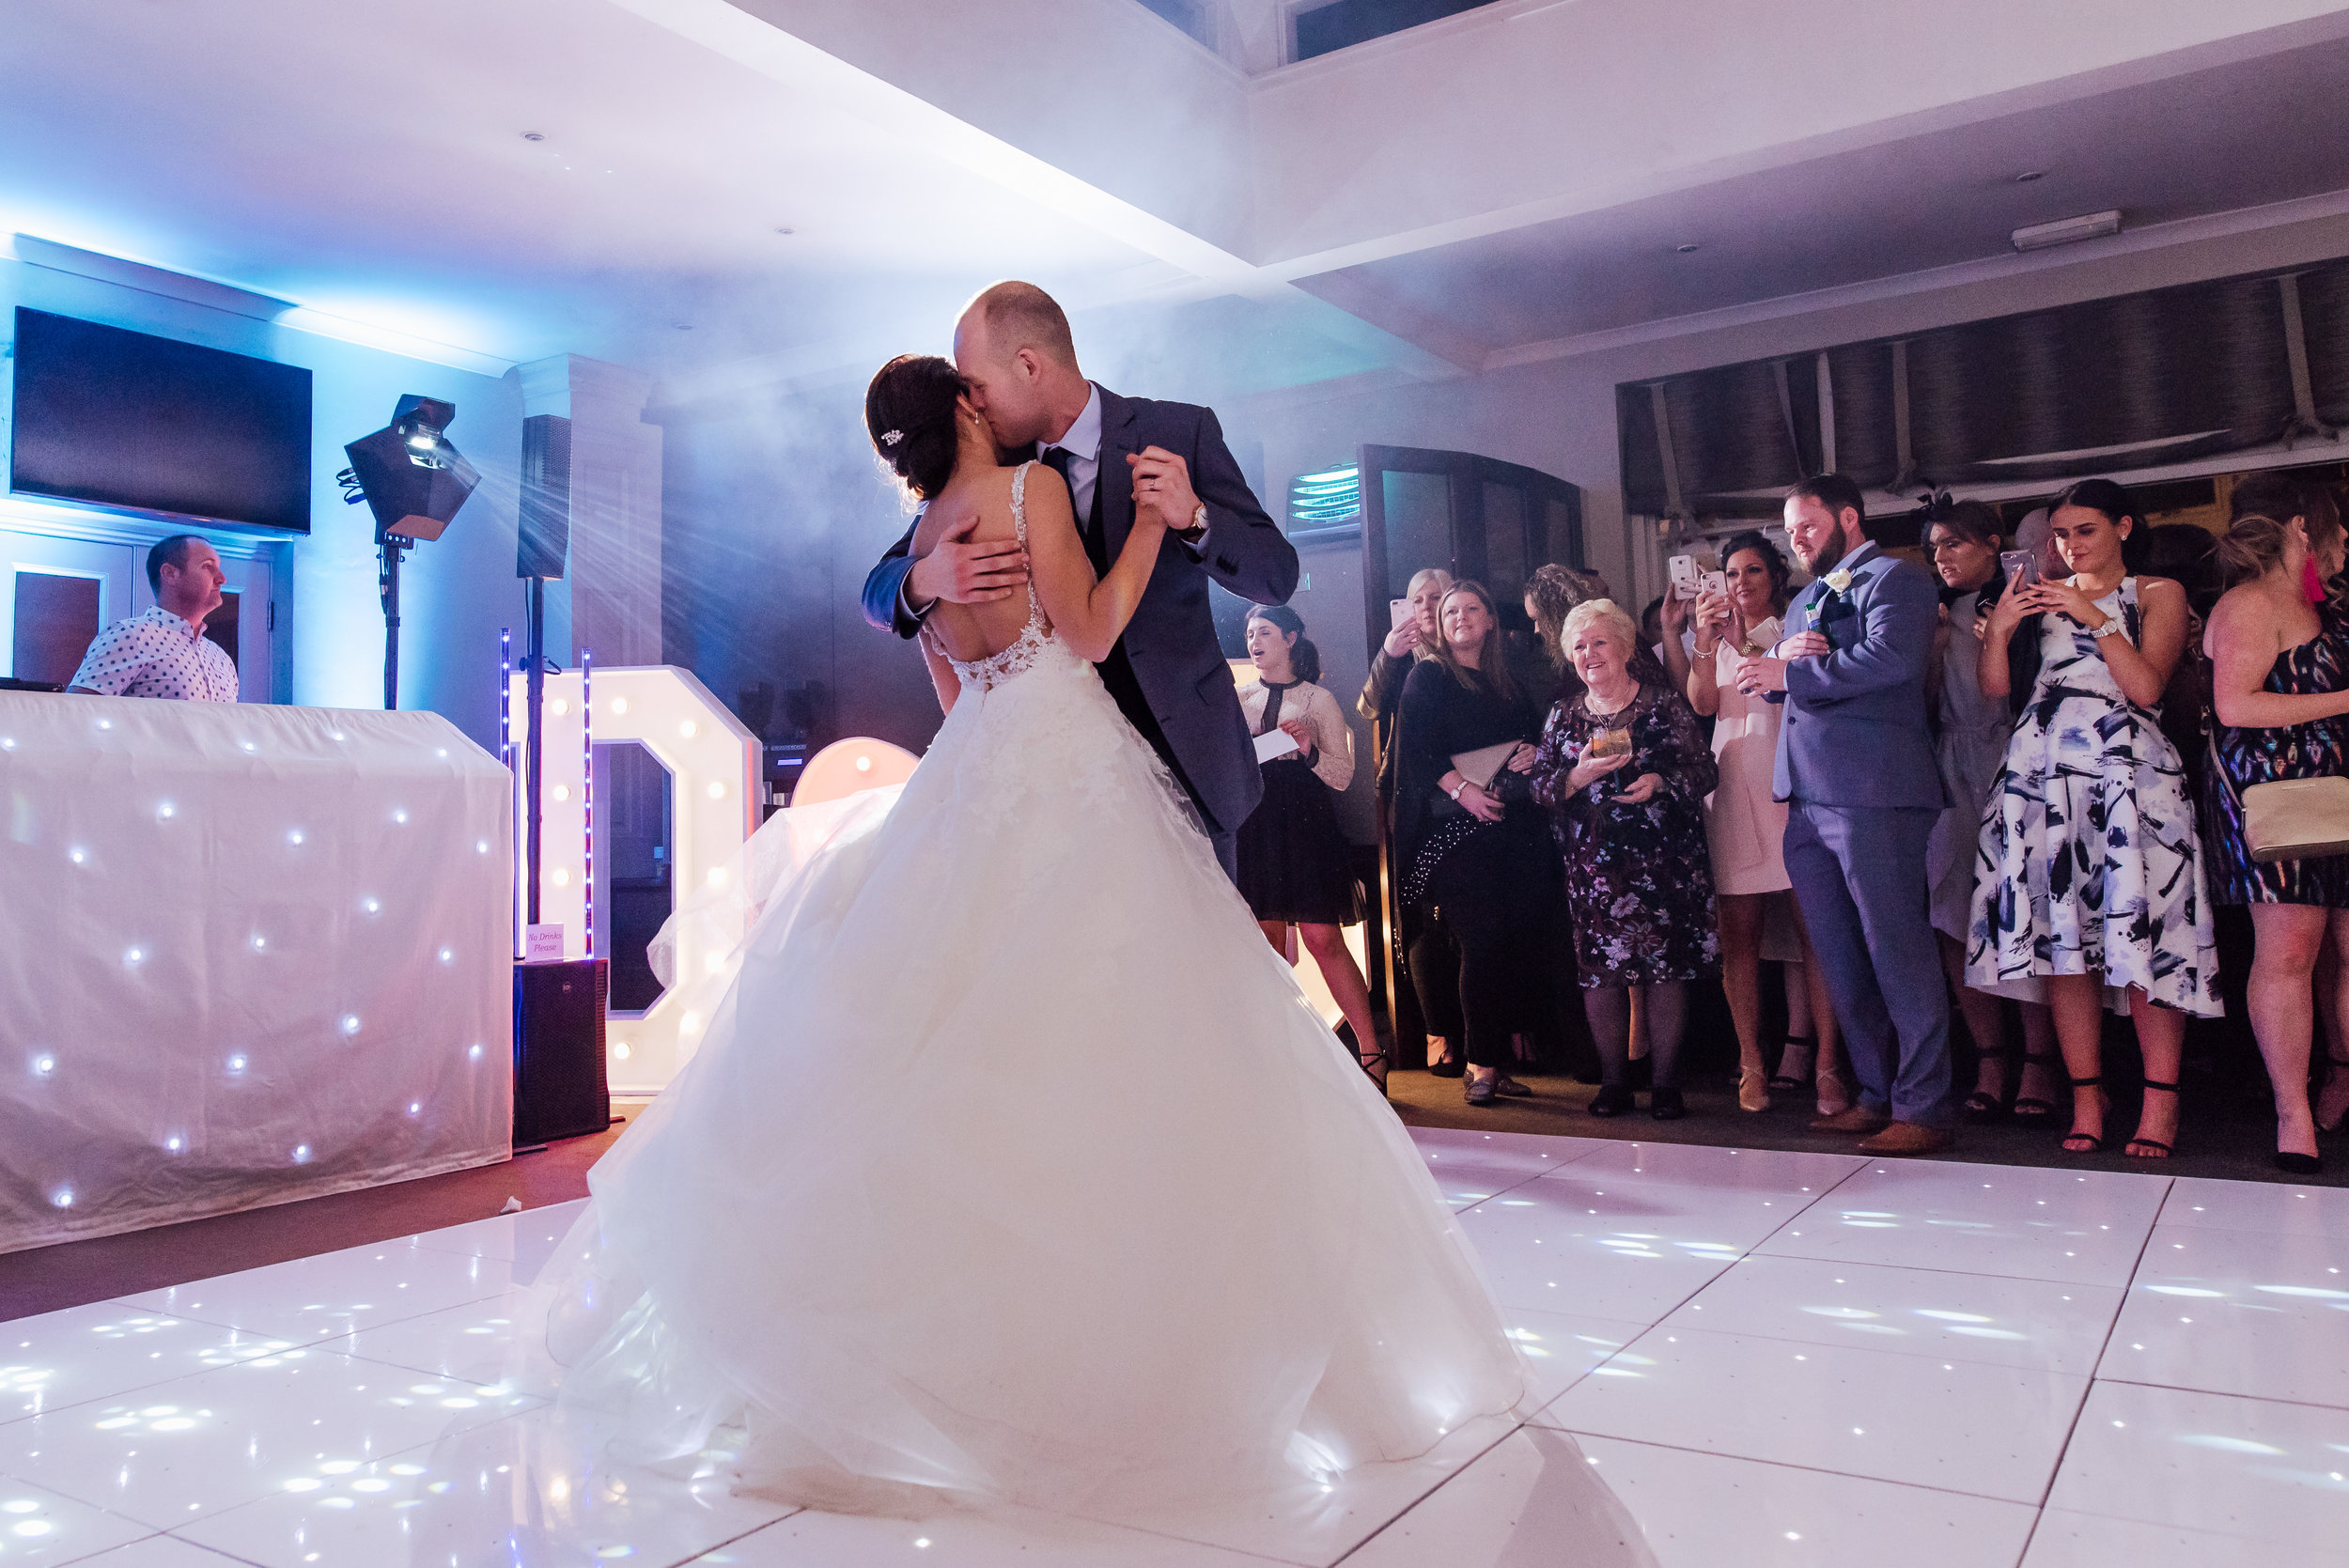 Sarah-Fishlock-Photography-Hampshire-wedding-photographer : fleet-wedding-photographer-fleet : warbrook-house-wedding-venue : warbrook-house-wedding-photographer : hampshire-wedding-venue : hampshire-stately-home-wedding-venue /